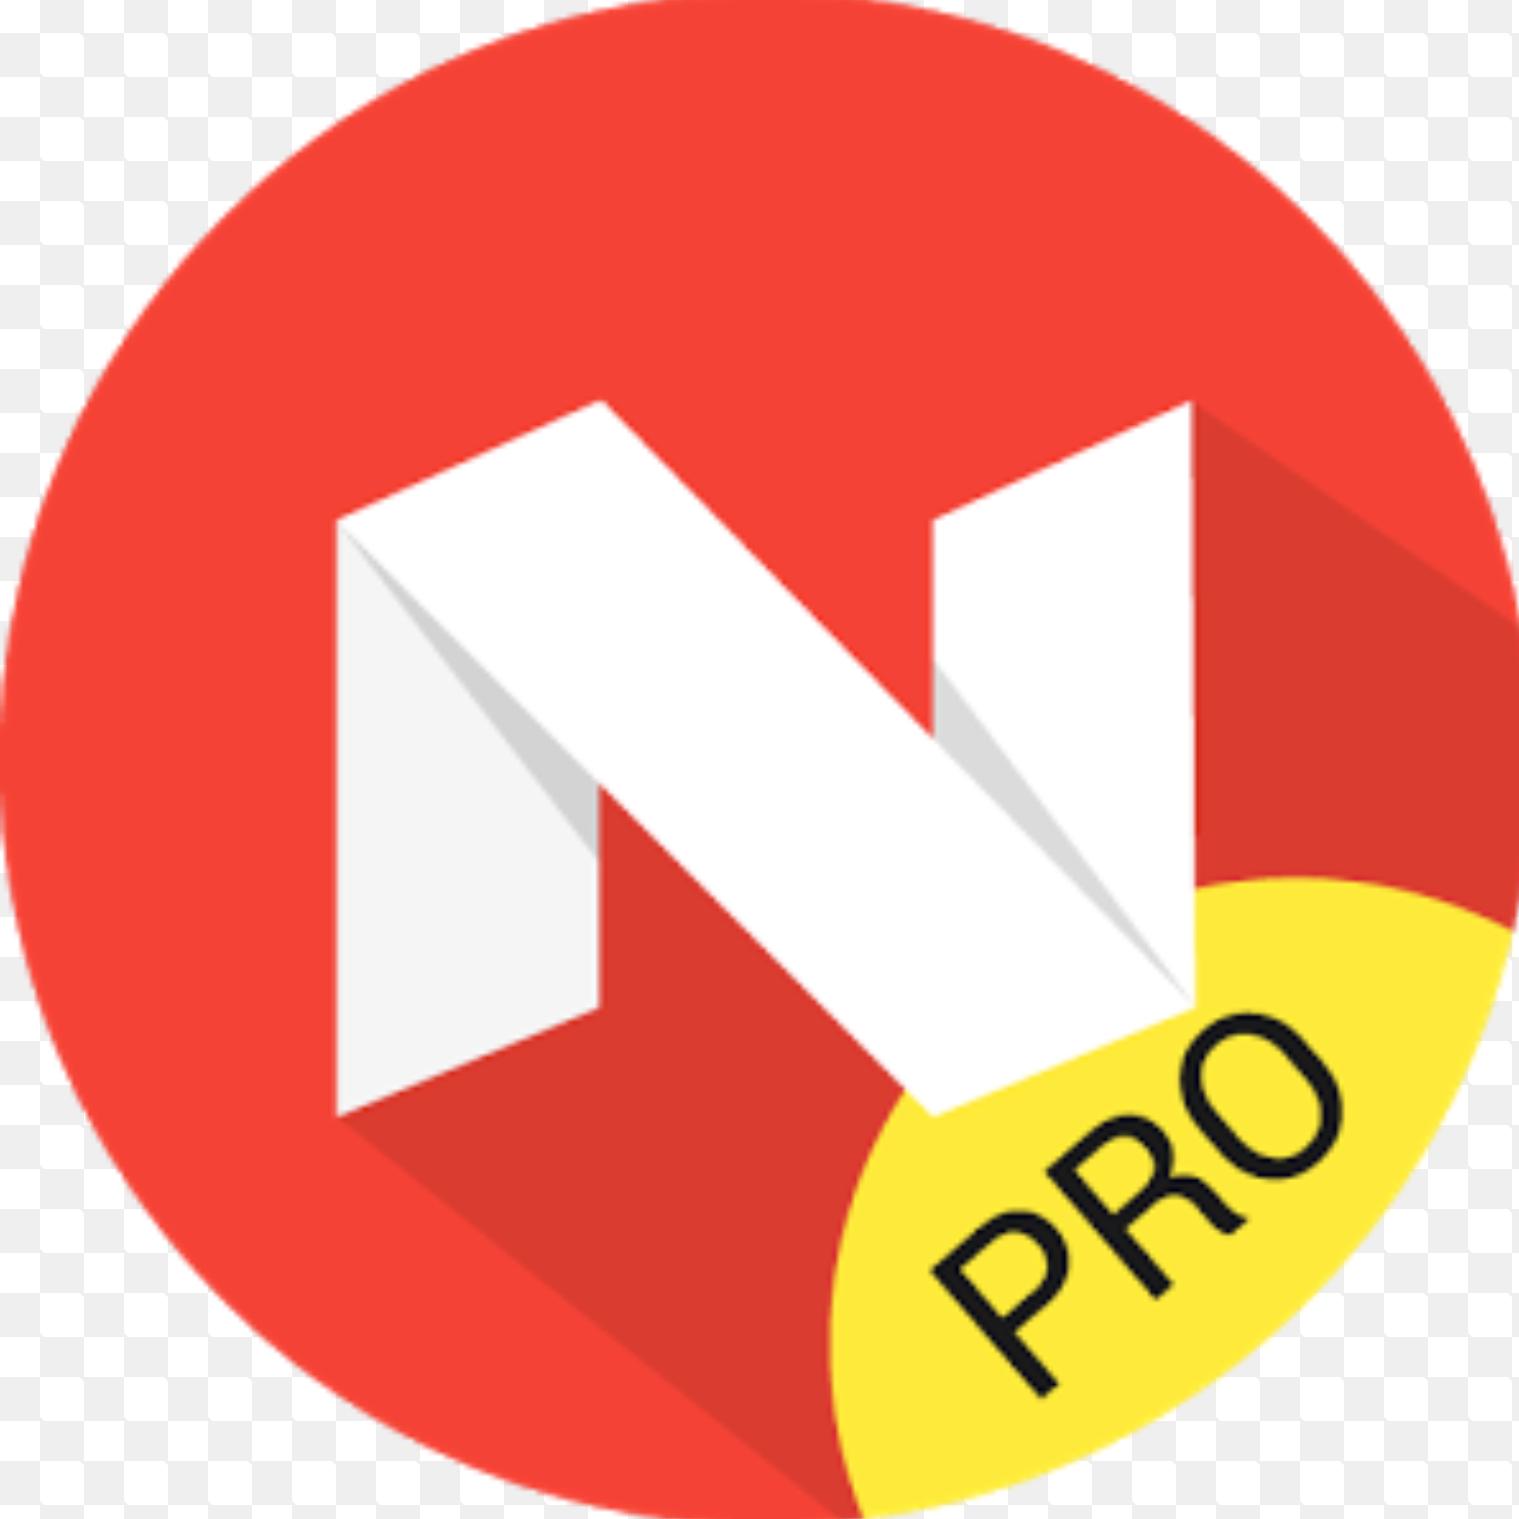 [Android] N Launcher Pro - Nougat 7.0   0,00€ statt 3,39€